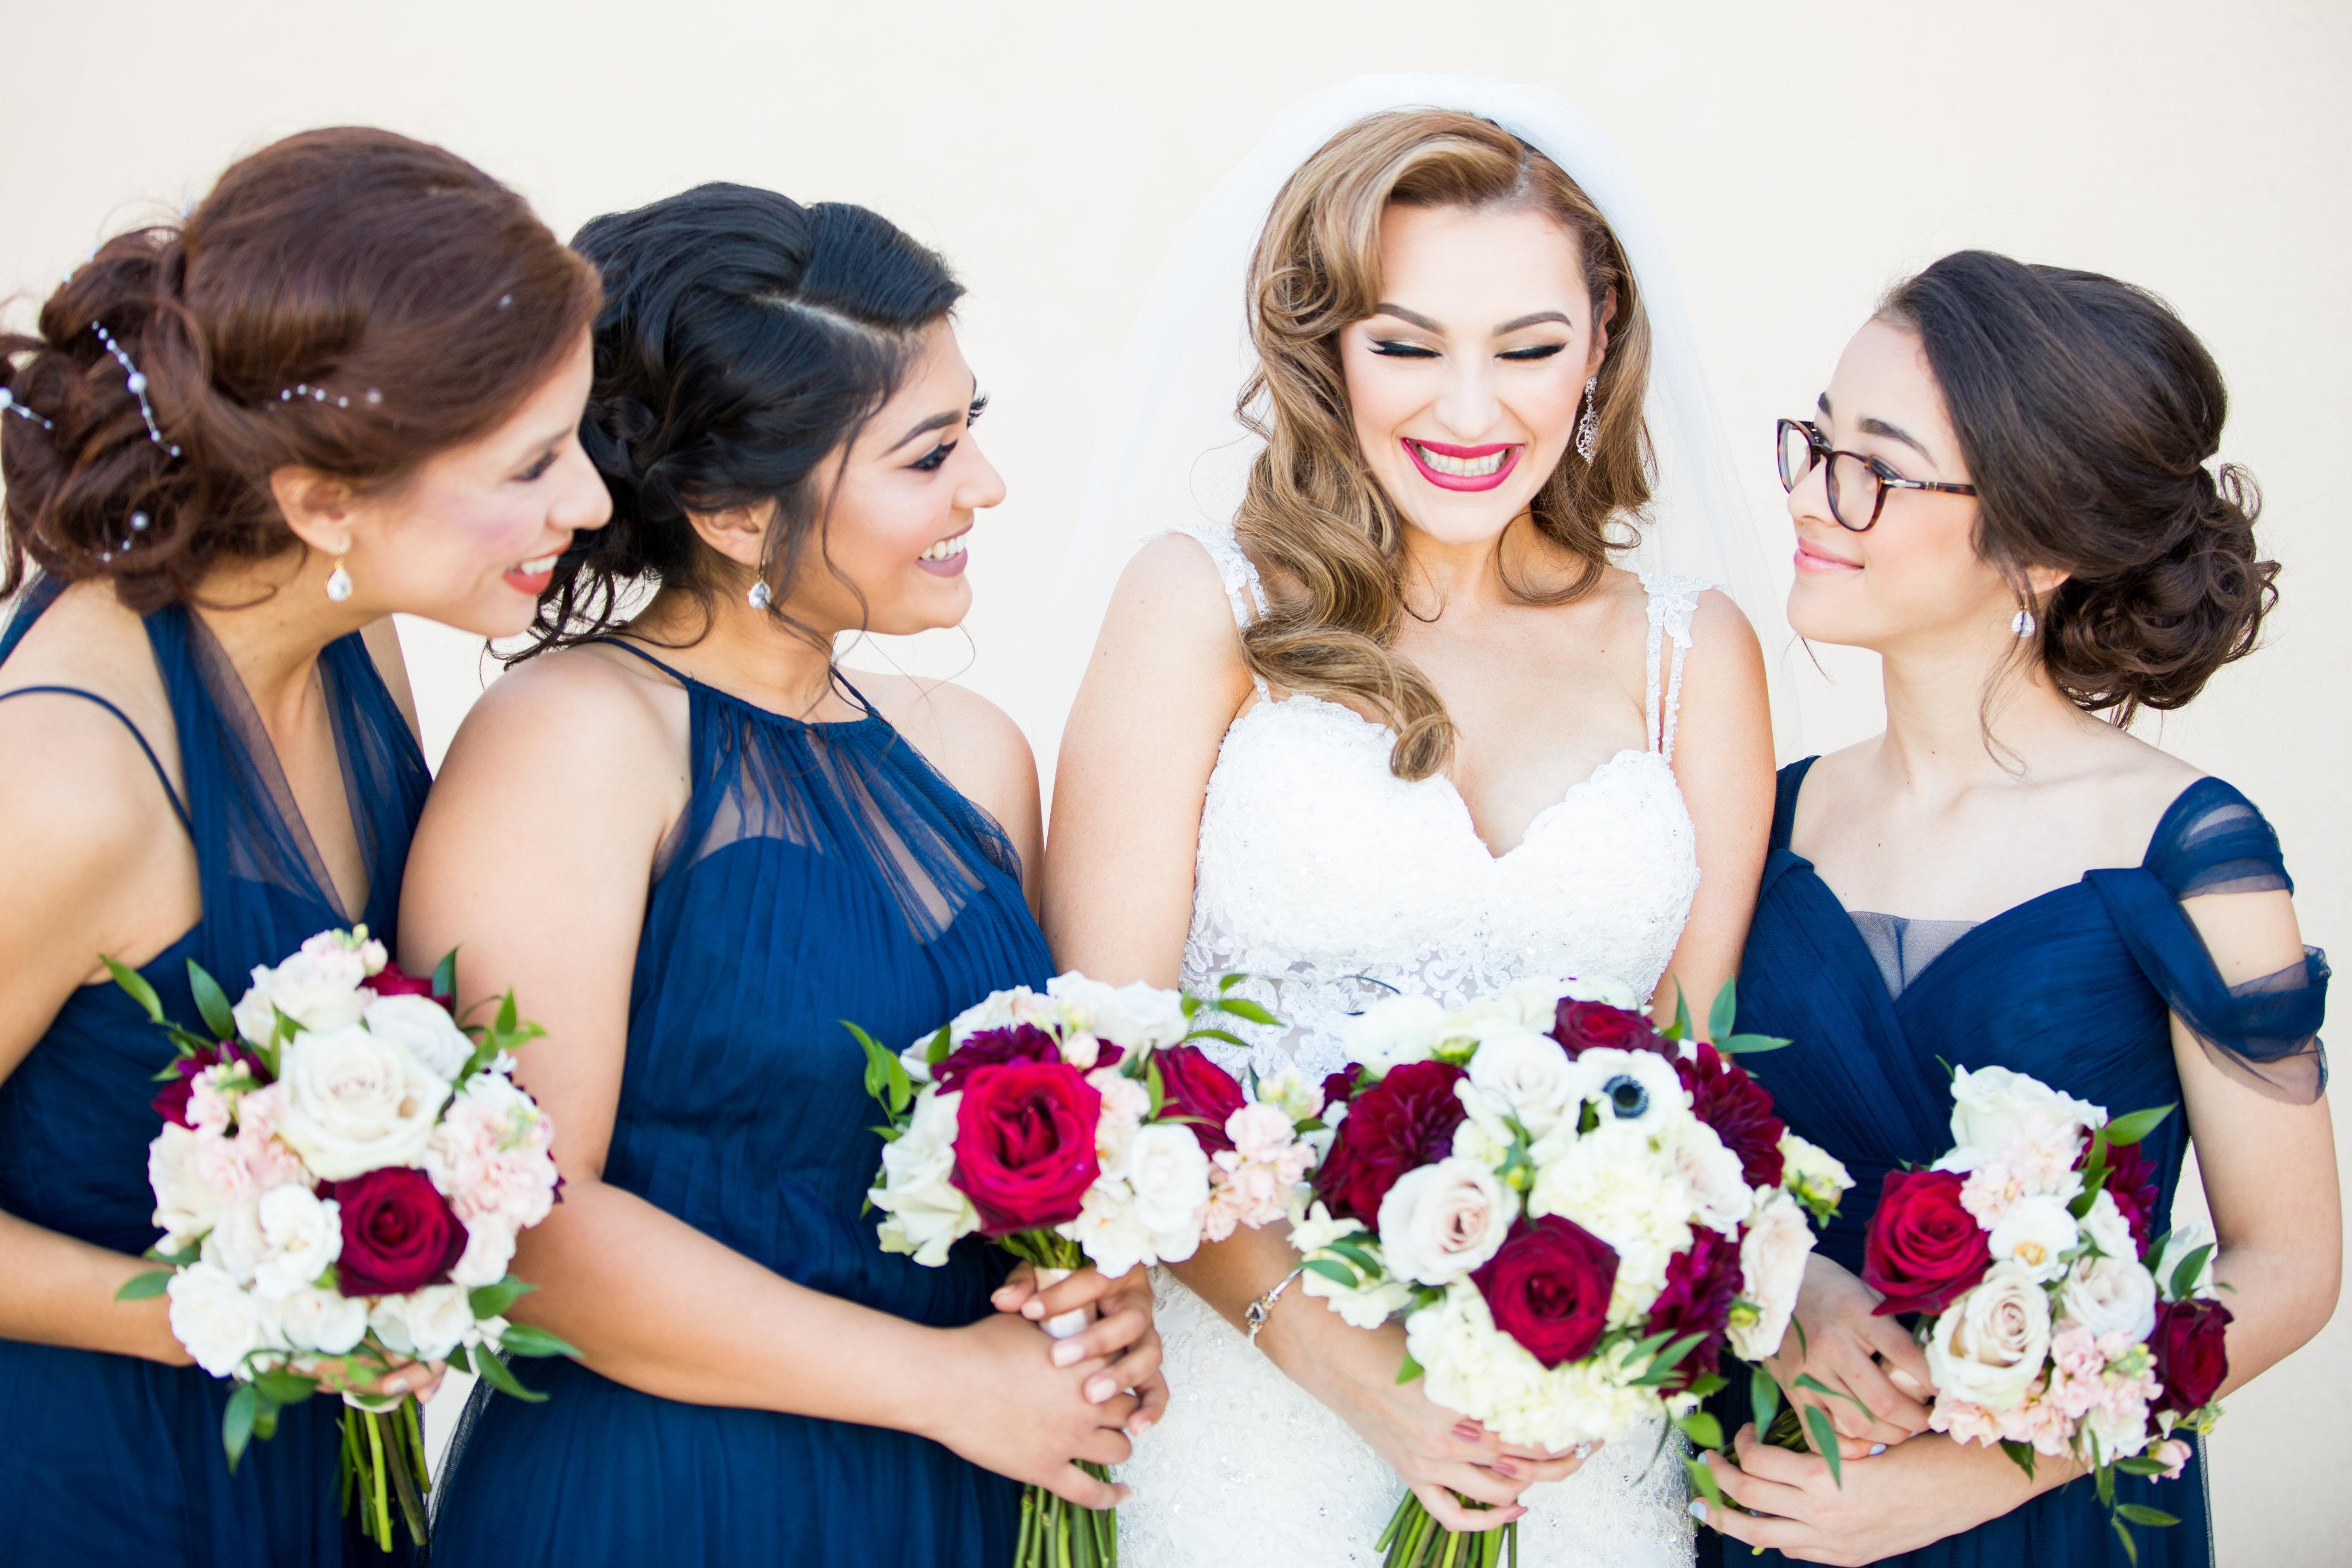 Chic Patriotic Wedding - Your Jubilee Weddings & Events